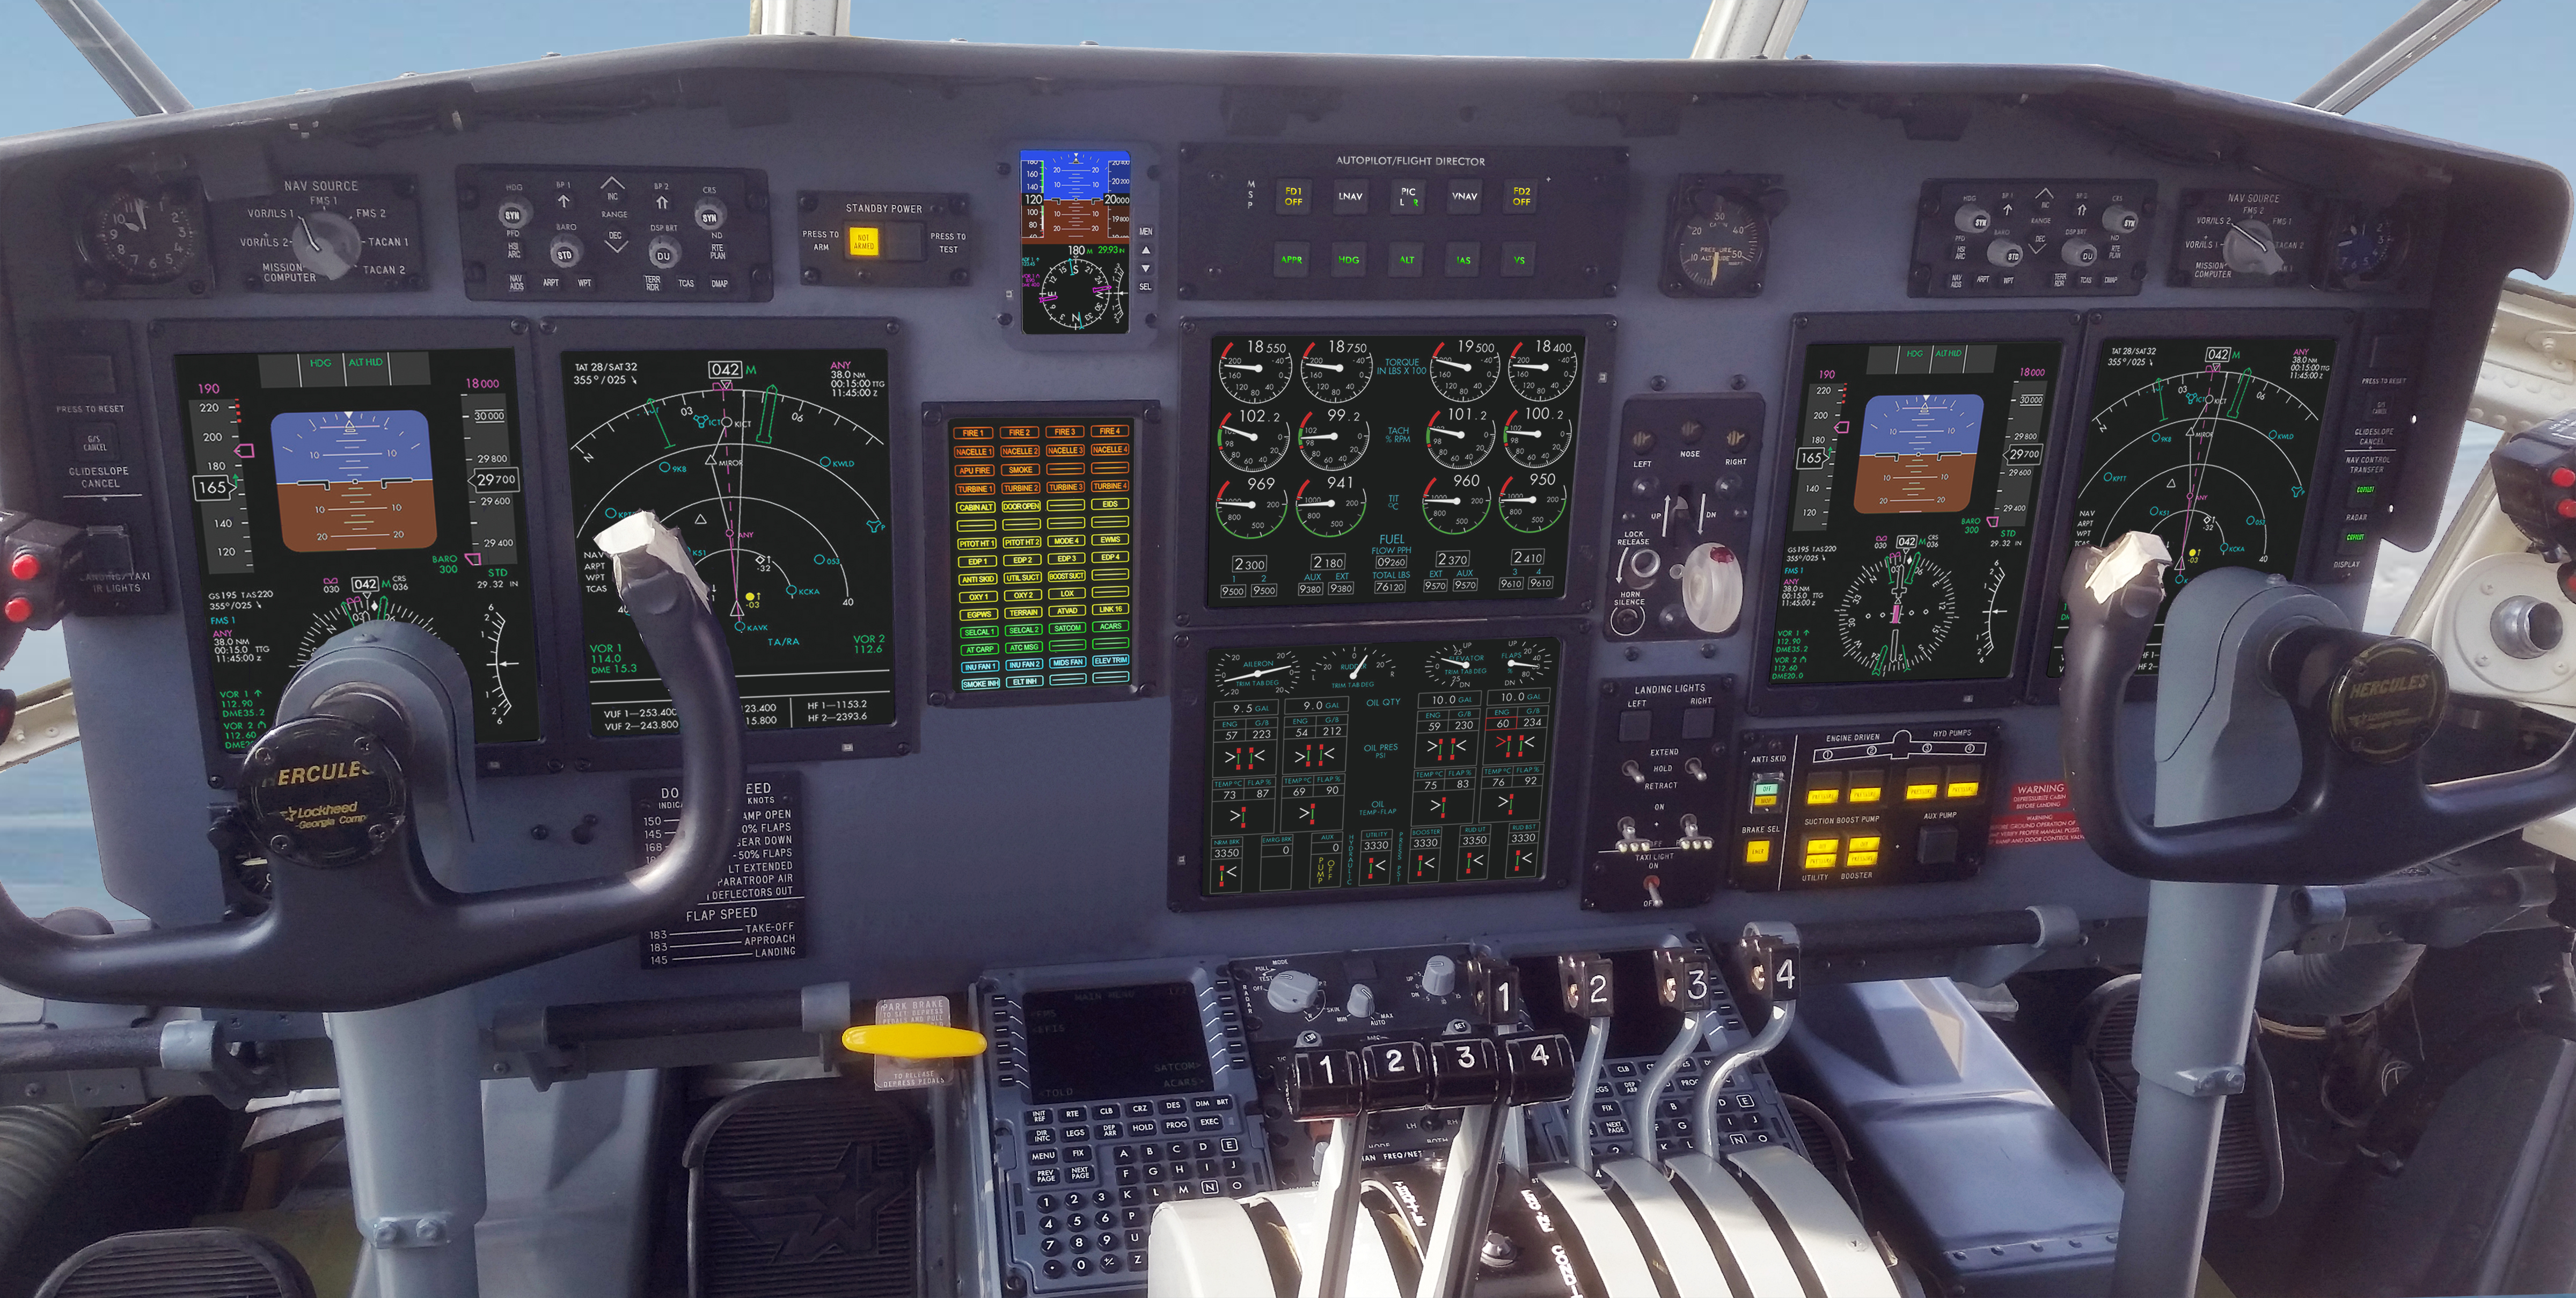 Innovative Solutions & Support Completes NextGen C-130